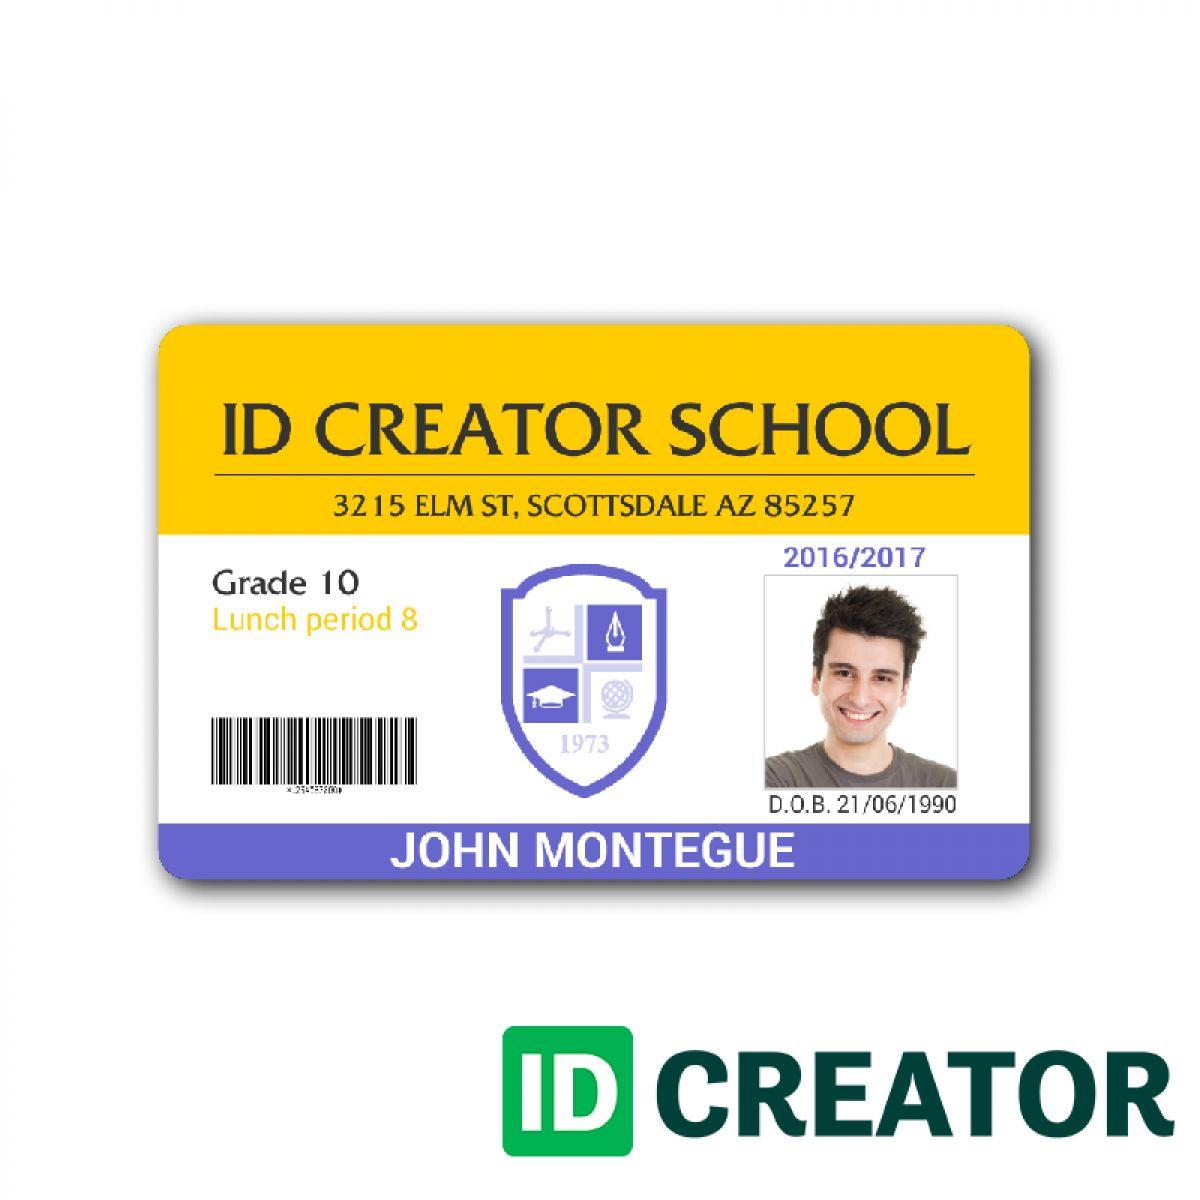 Faculty Id Card Template Atlantaauctionco Inside Faculty Id Card Template In 2020 Id Card Template School Id Card Template